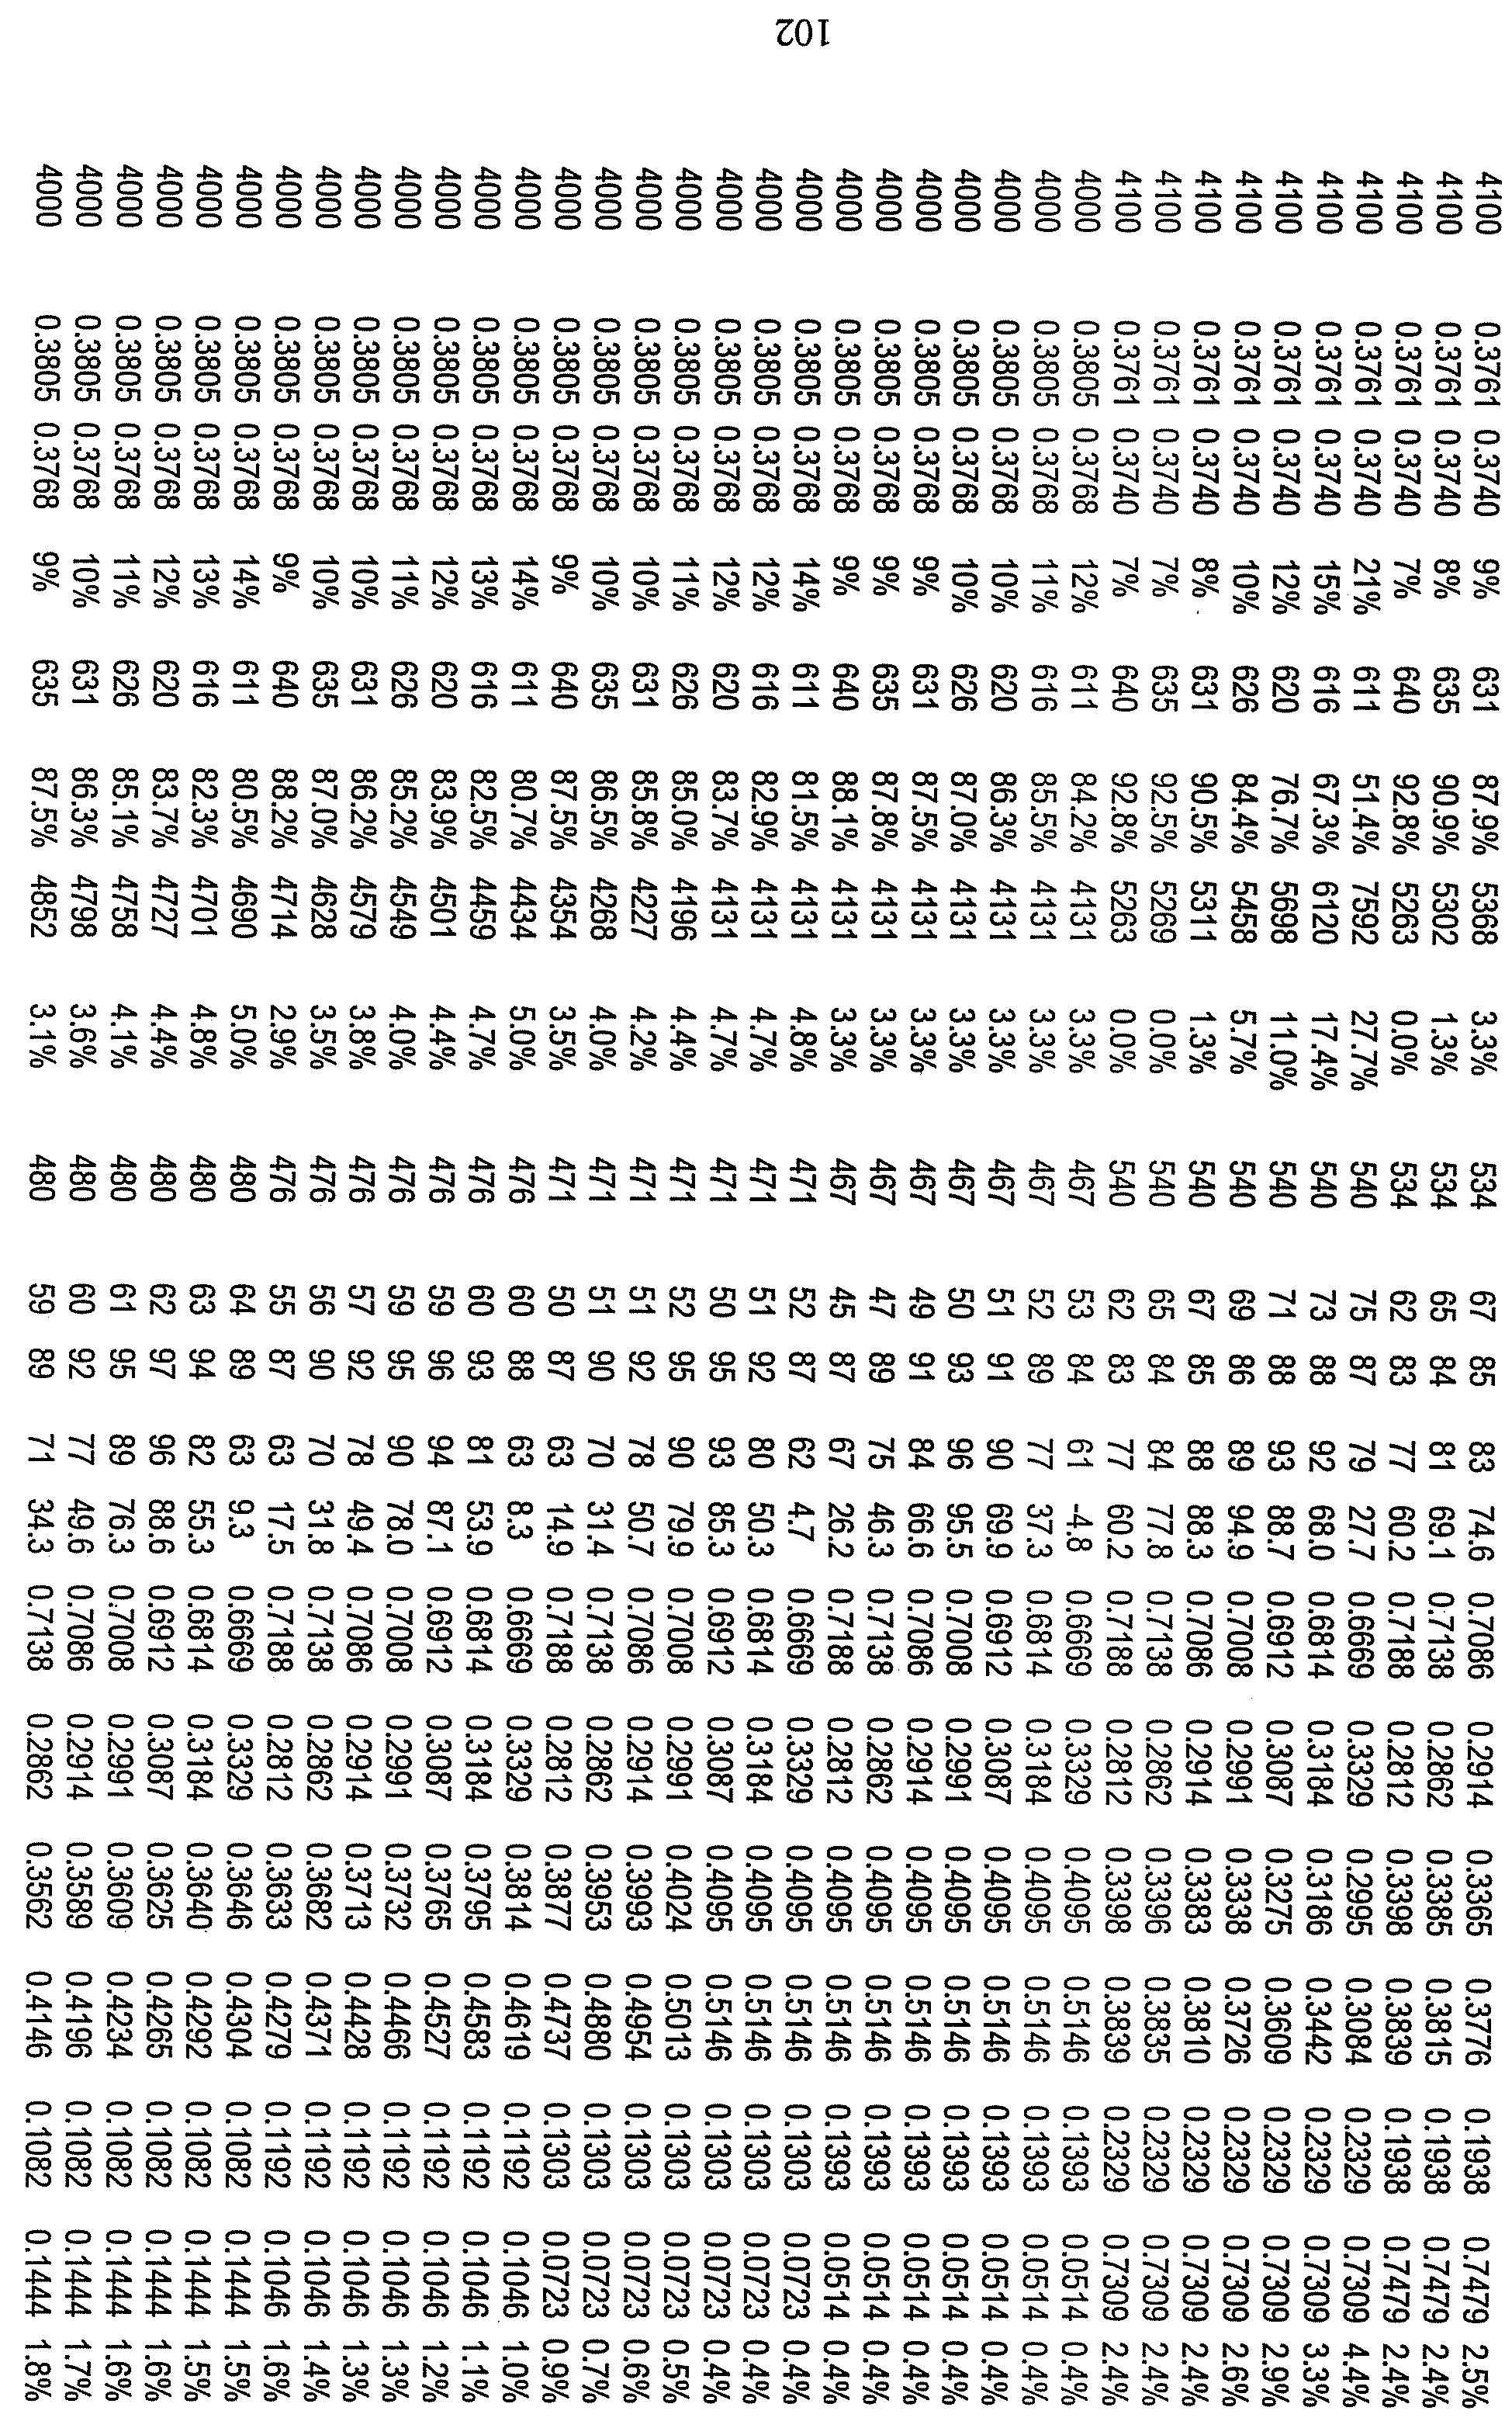 Figure 112010029469117-pct00068